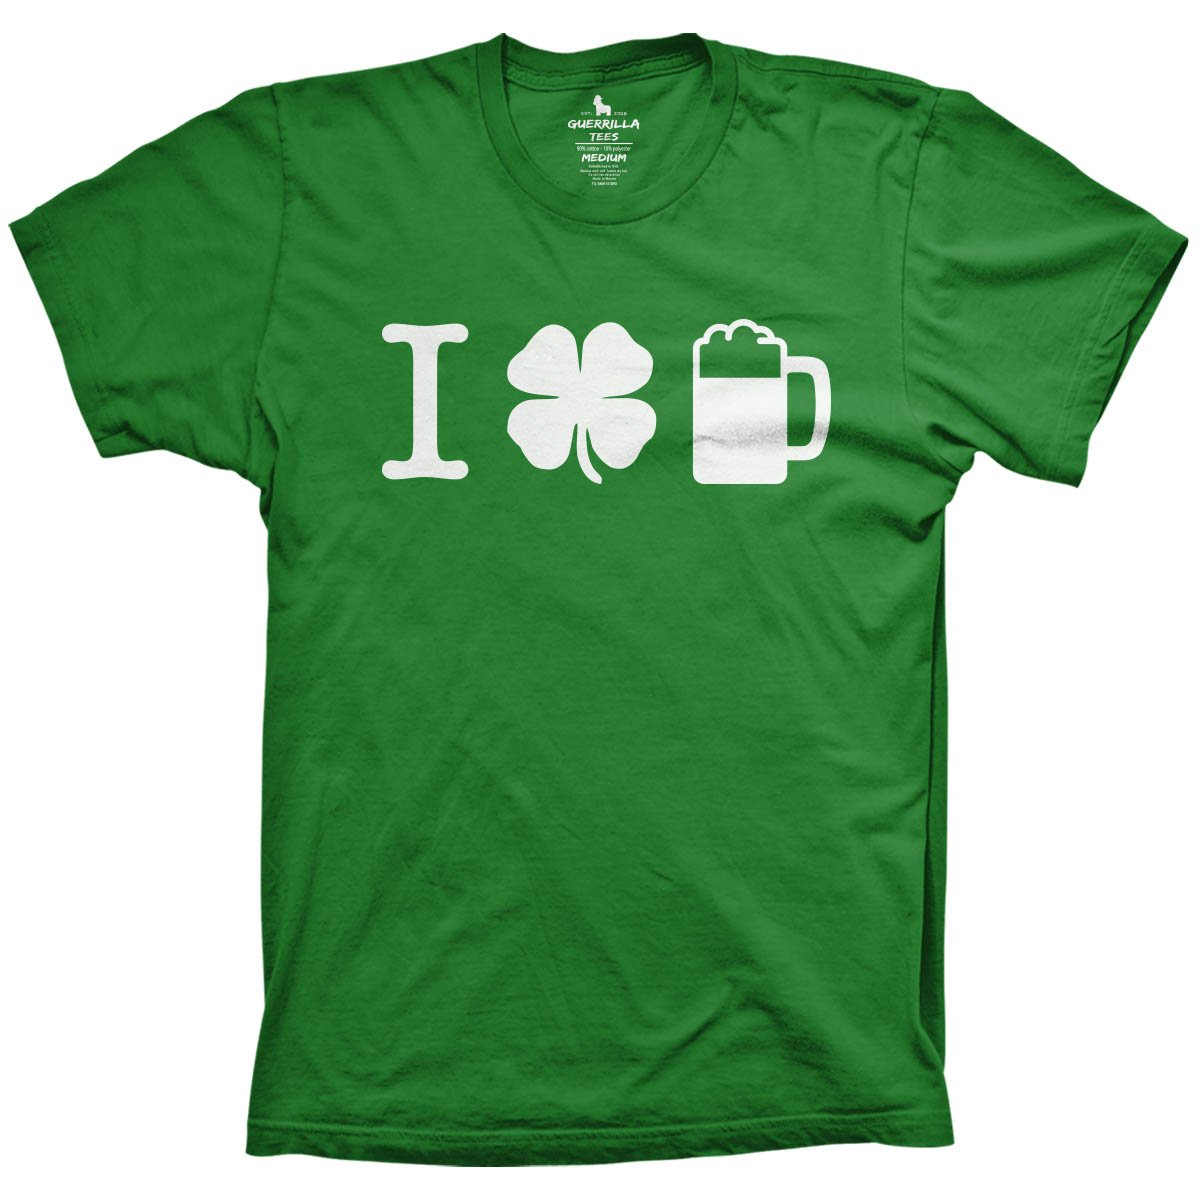 a595aa31c I Shamrock Beer T-Shirt | Buy St Patricks Day T-Shirts